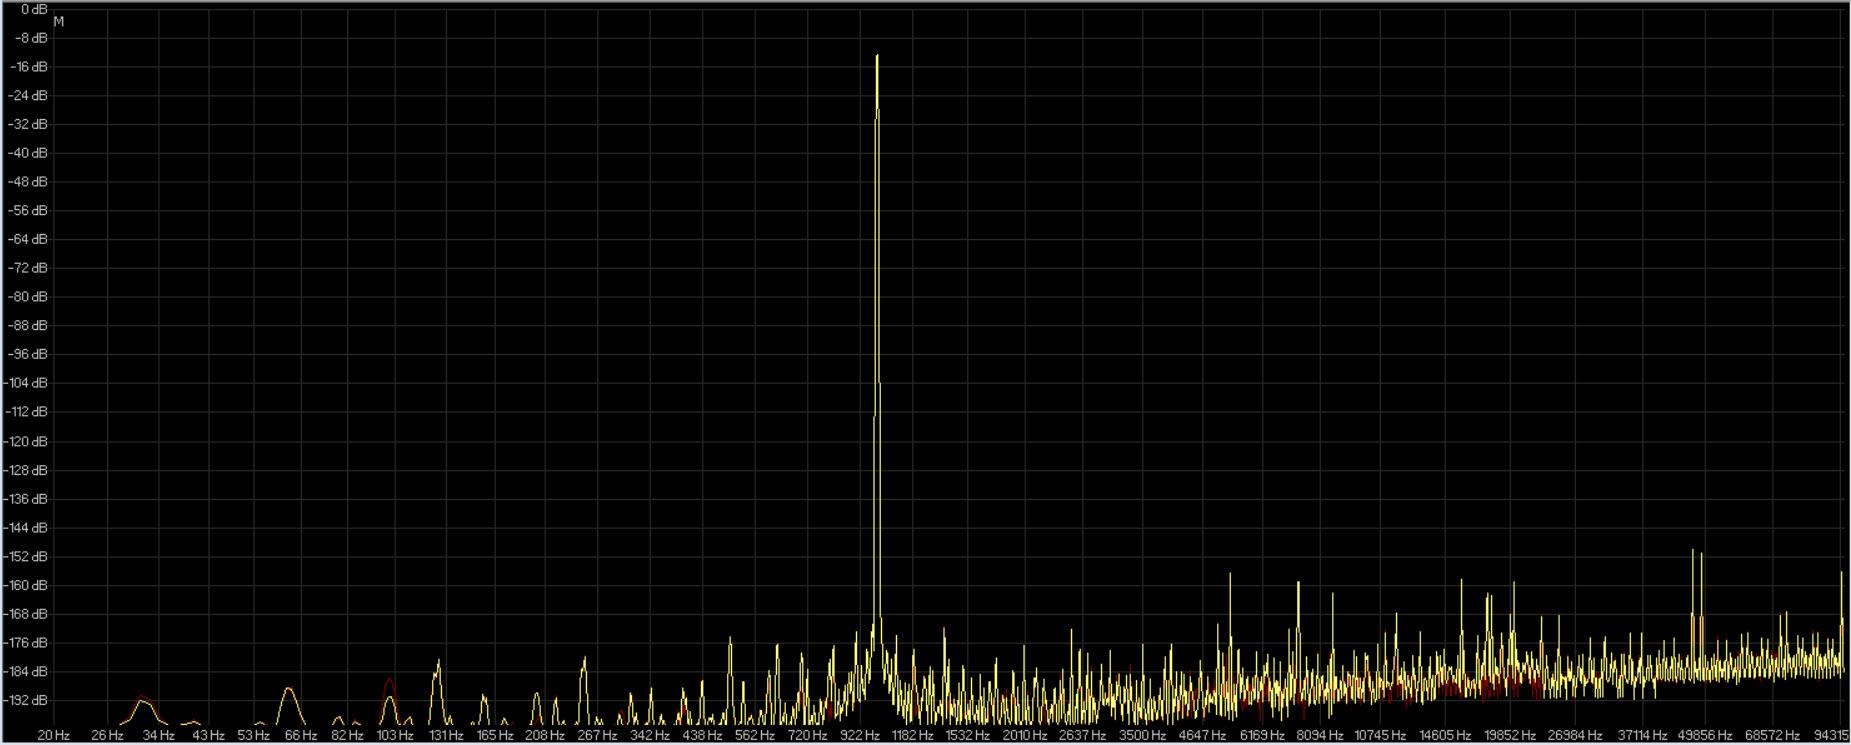 64fp-44.1 wavelab 6 ( giallo ) saracon ( rosso ).jpg